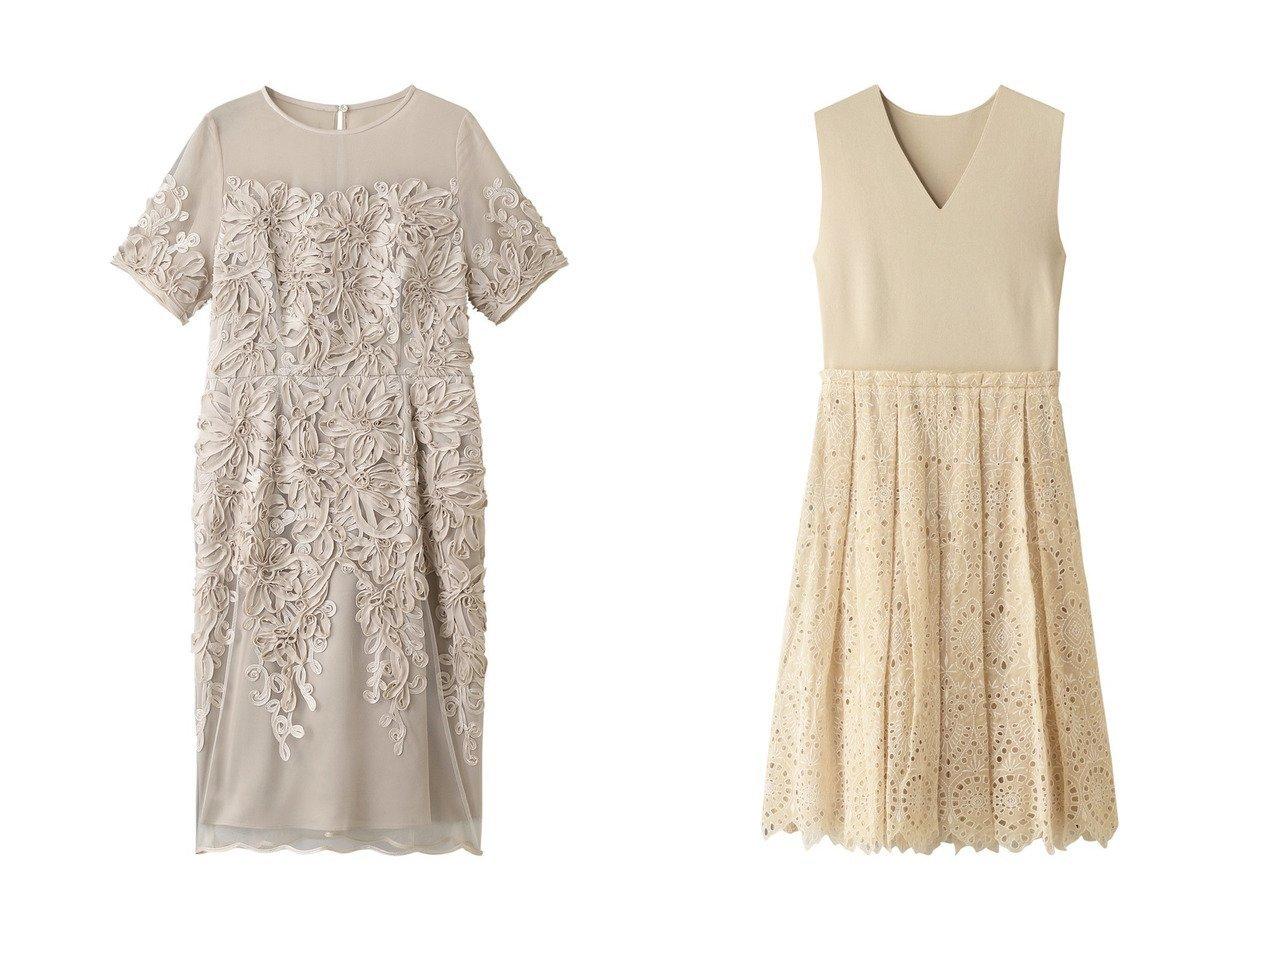 【ANAYI/アナイ】のチュールシシュウソデツキワンピース&ミラノリブシシュウレースタックワンピース ワンピース・ドレスのおすすめ!人気、トレンド・レディースファッションの通販 おすすめで人気の流行・トレンド、ファッションの通販商品 メンズファッション・キッズファッション・インテリア・家具・レディースファッション・服の通販 founy(ファニー) https://founy.com/ ファッション Fashion レディースファッション WOMEN ワンピース Dress チュール デコルテ パーティ フェミニン フラワー ミラノリブ レース |ID:crp329100000009357